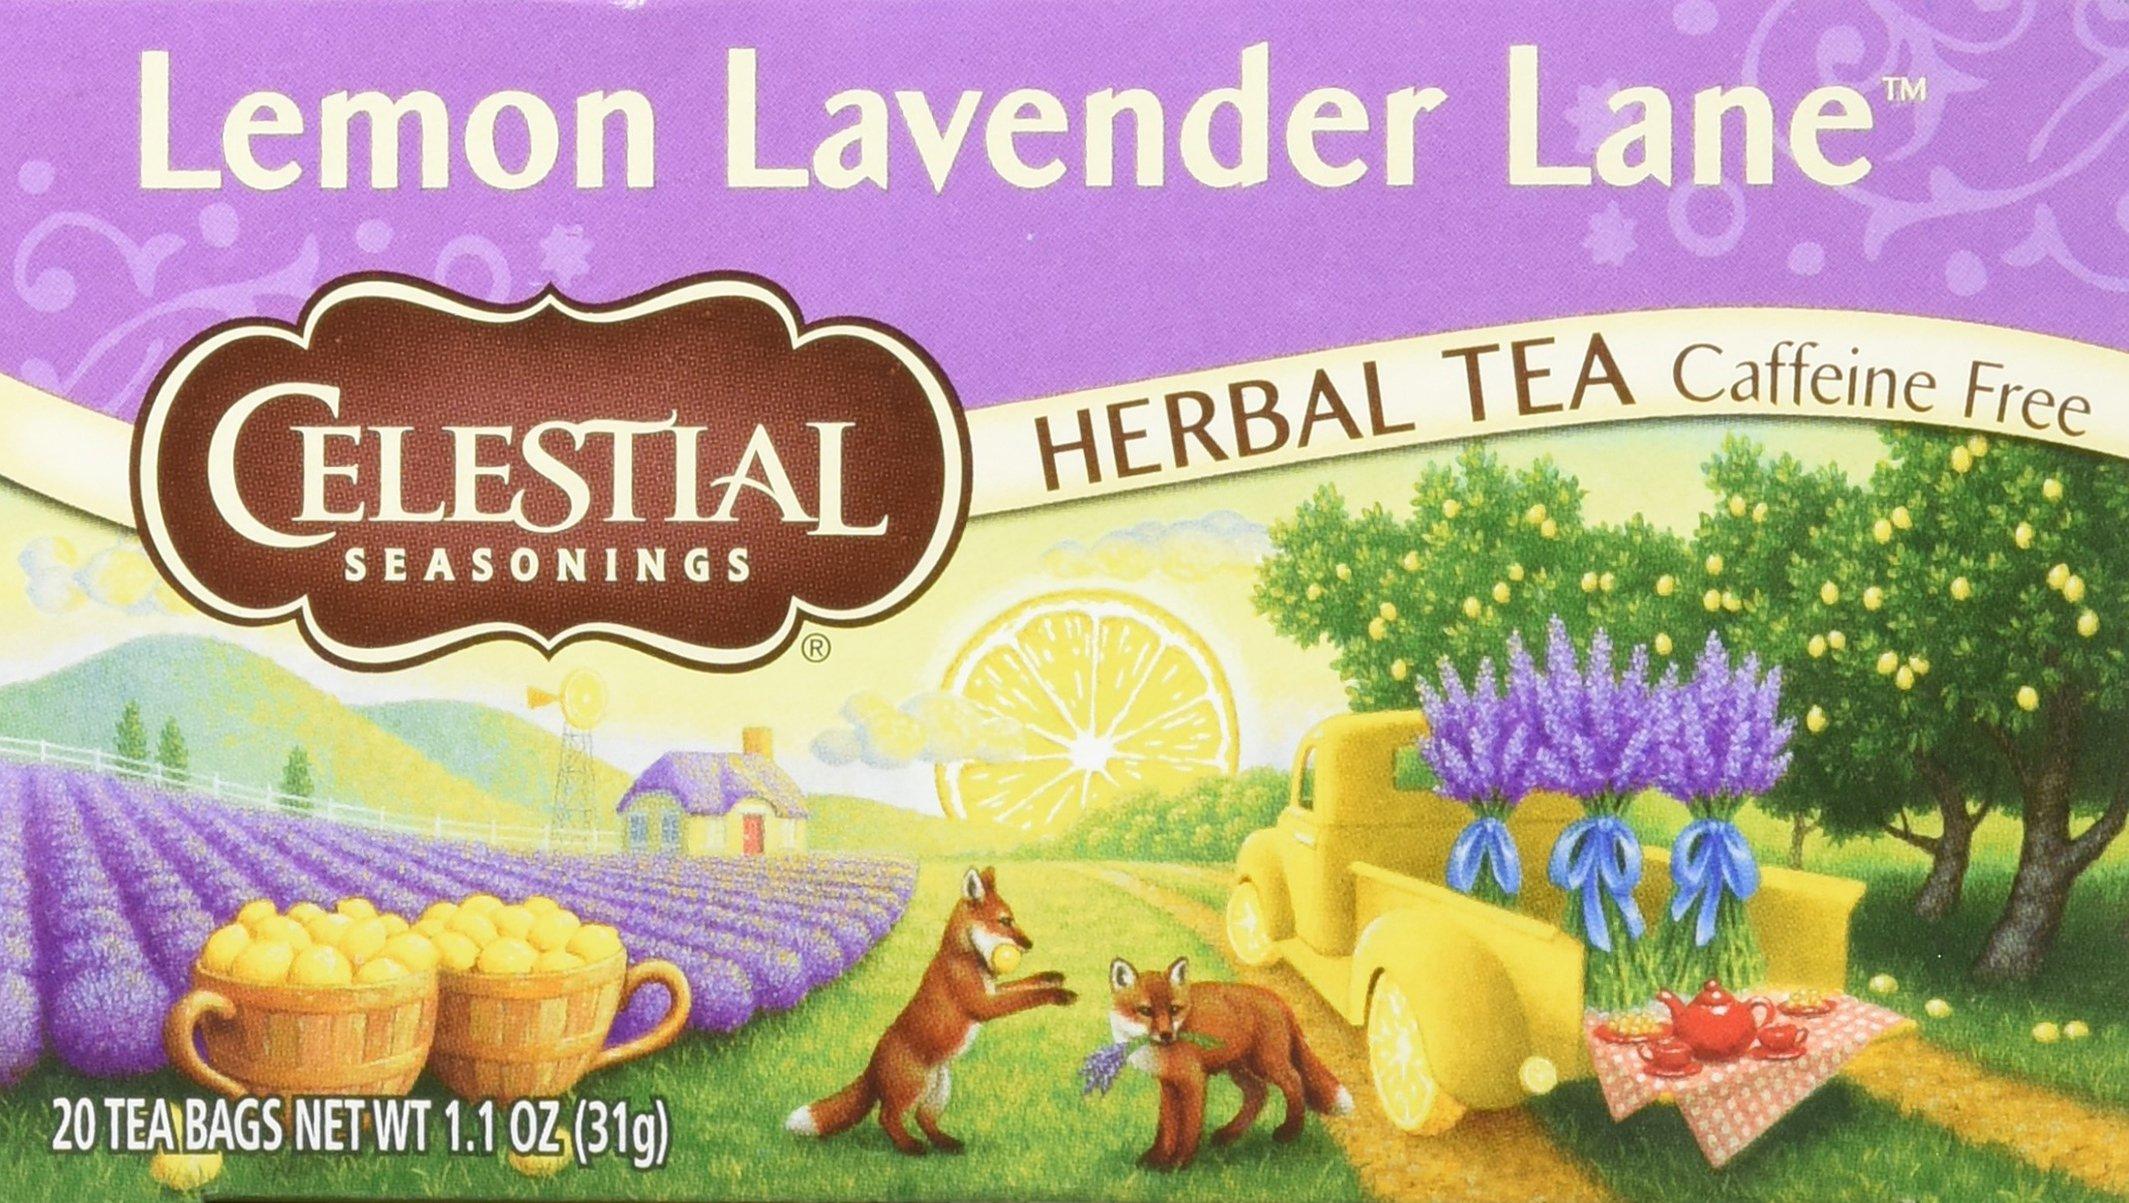 Celestial Seasonings - Celestial Seasonings, Herbal Tea Lemon Lavender Lane, 20 Count